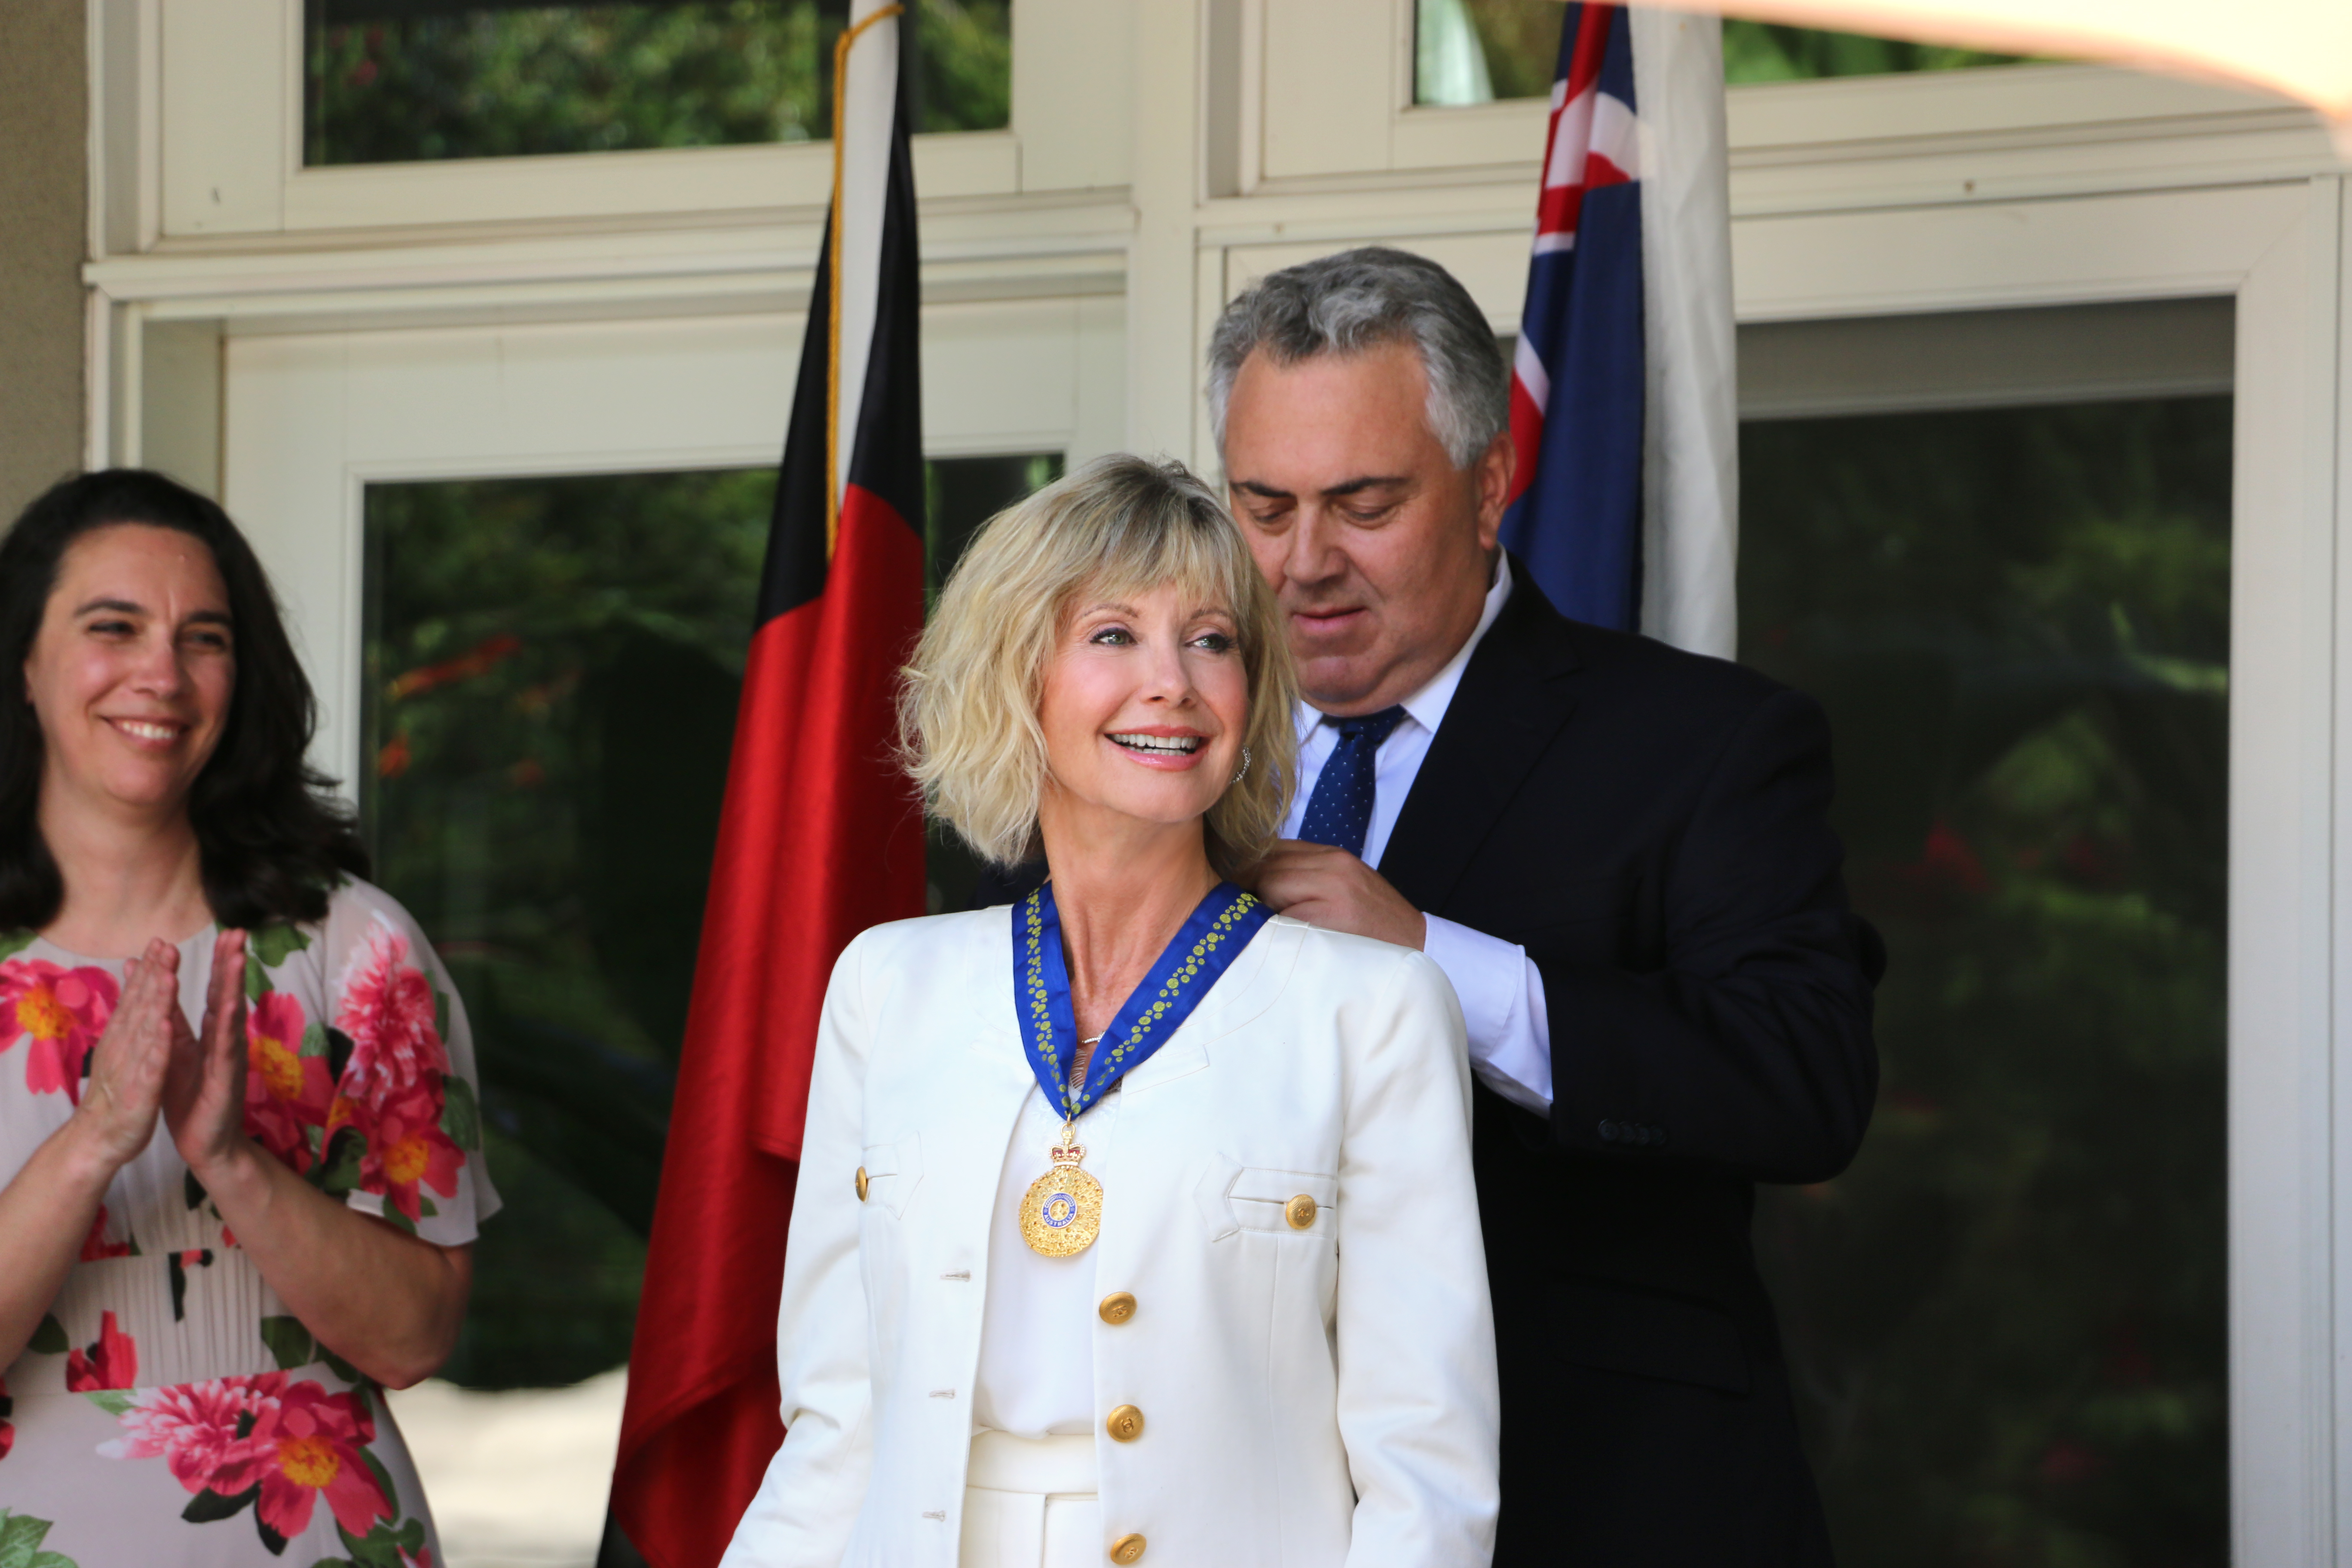 Companion to the Order of Australia, Olivia Newton-John 2019, Olivia Newton-John Los Angeles 2019